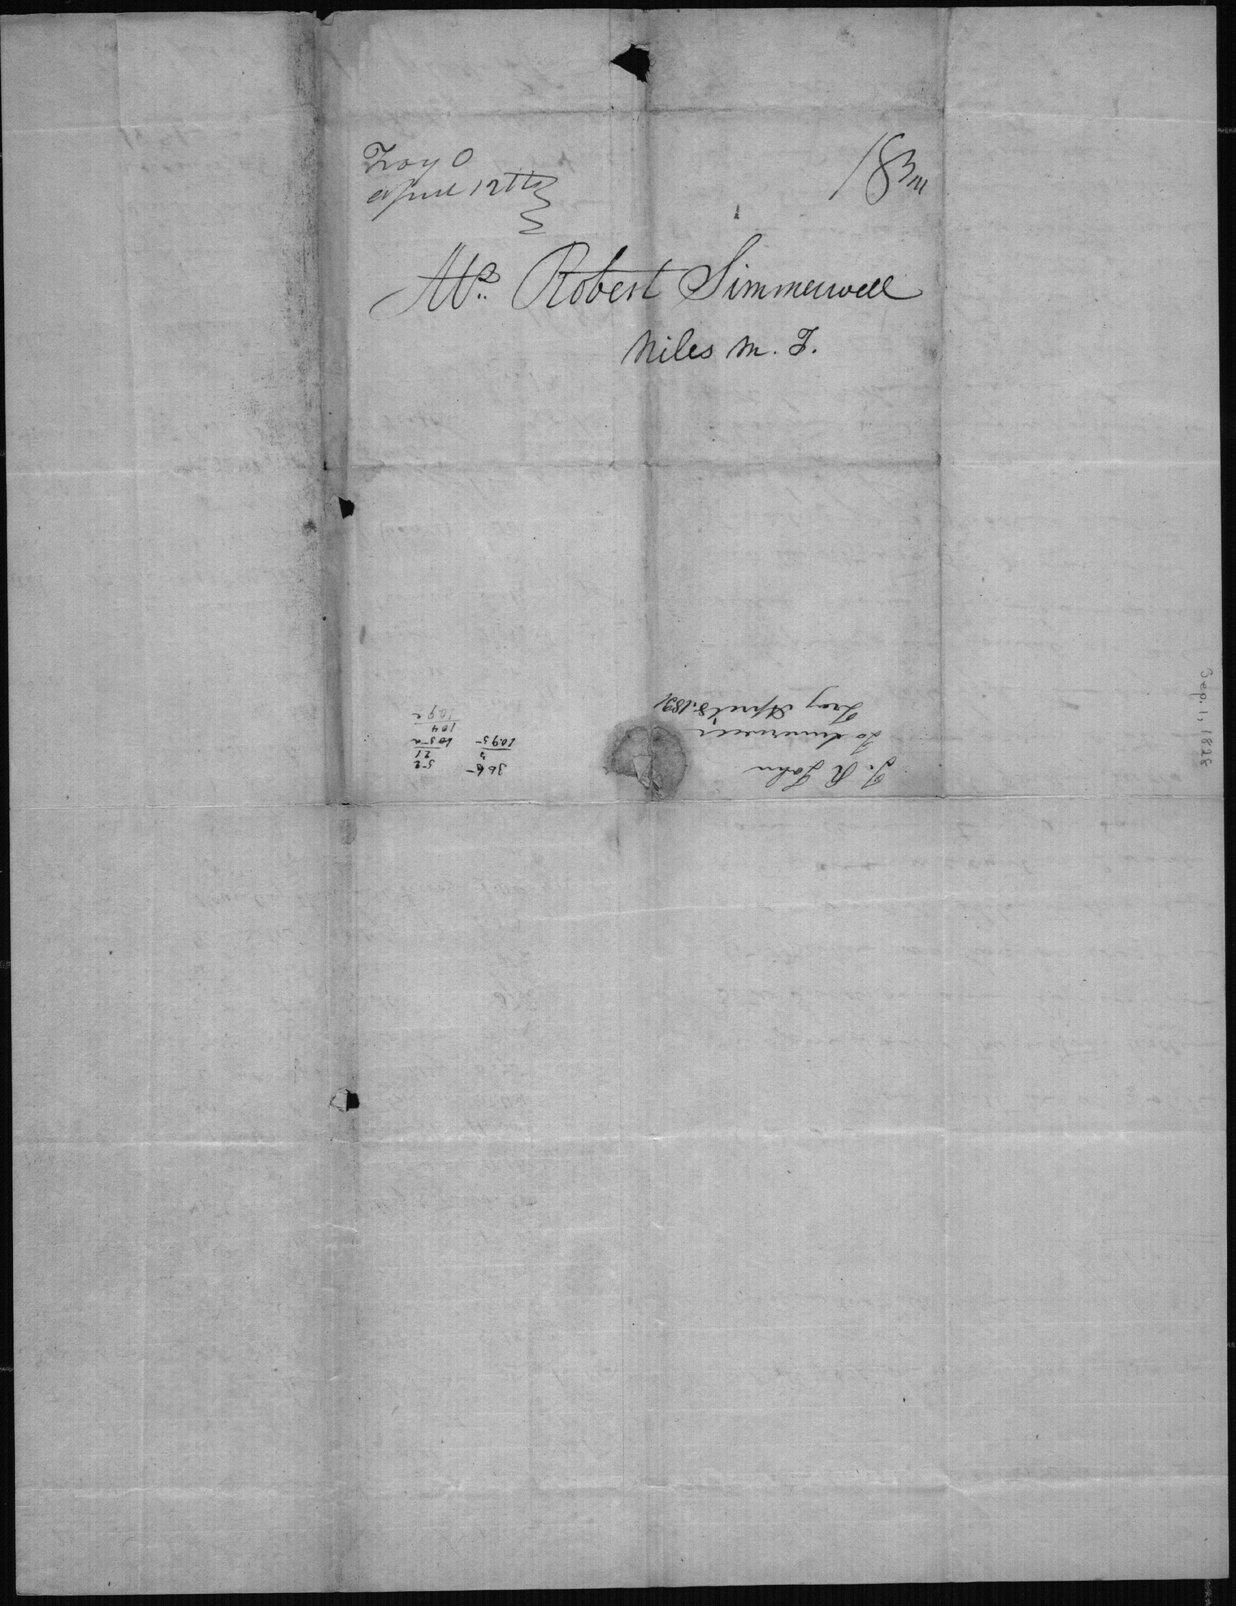 Joseph R. John to Robert Simerwell - 2